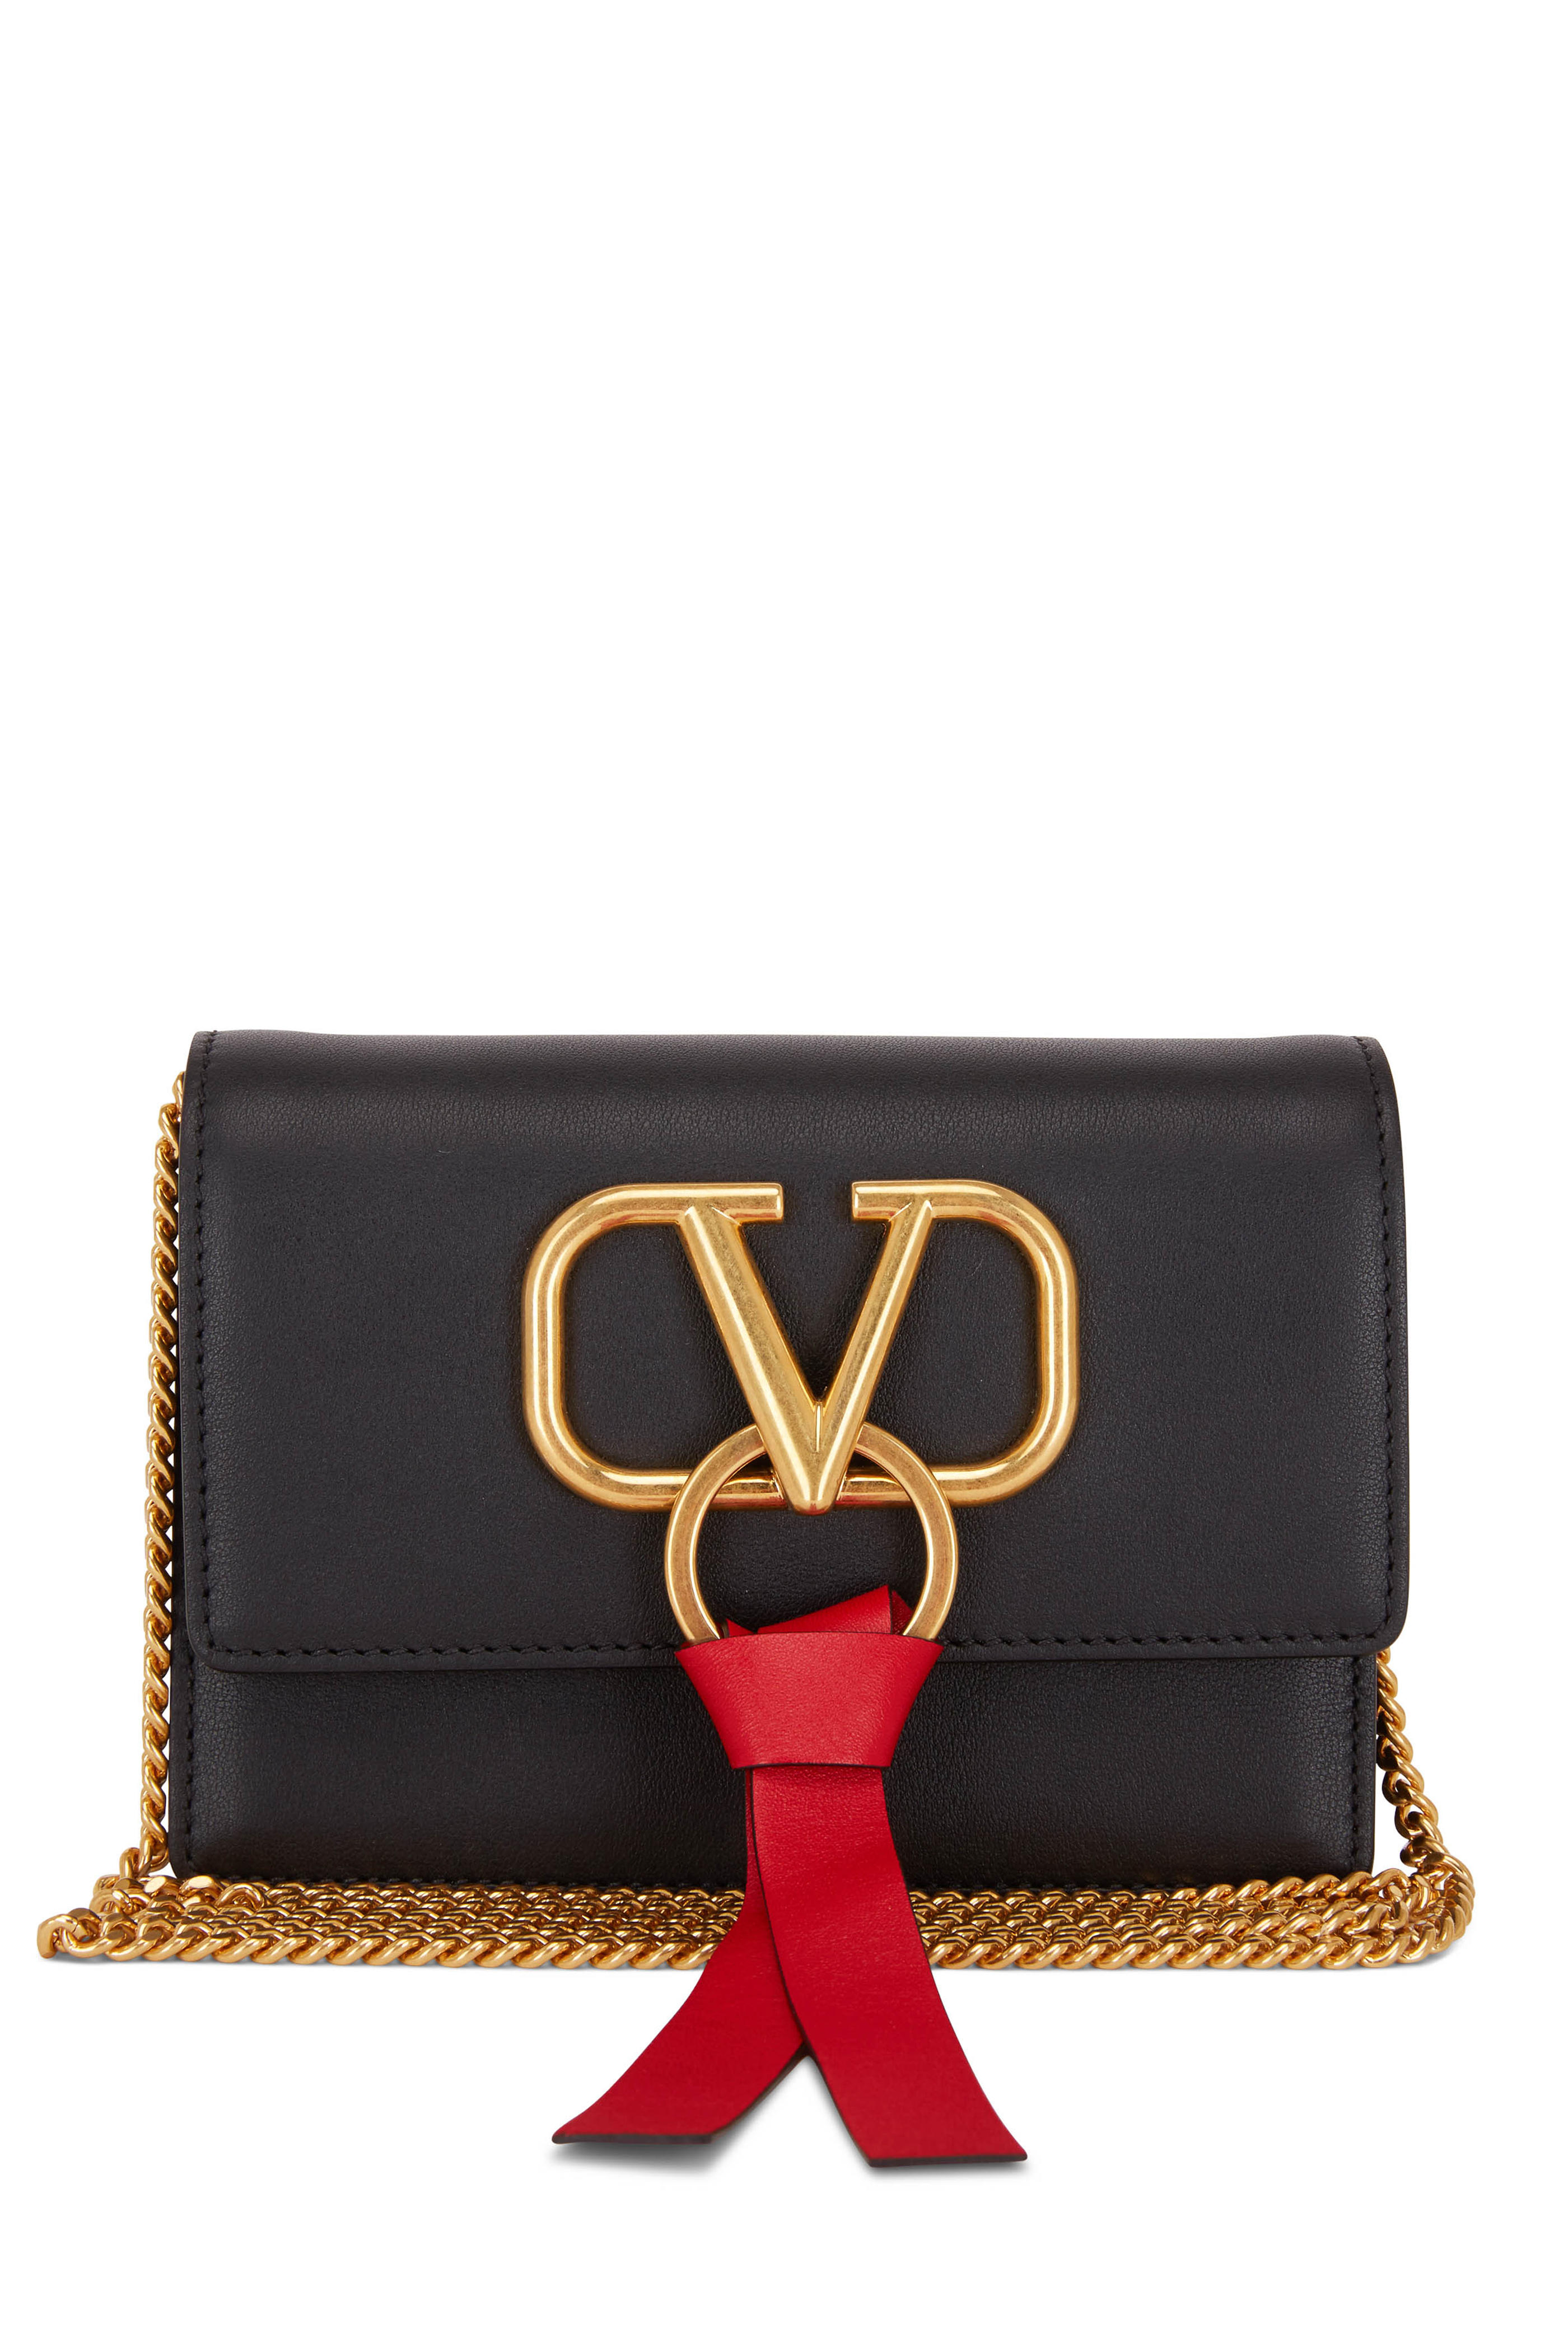 83e3fb062642b Valentino Garavani - VRing Black & Red Leather Mini Chain Crossbody ...